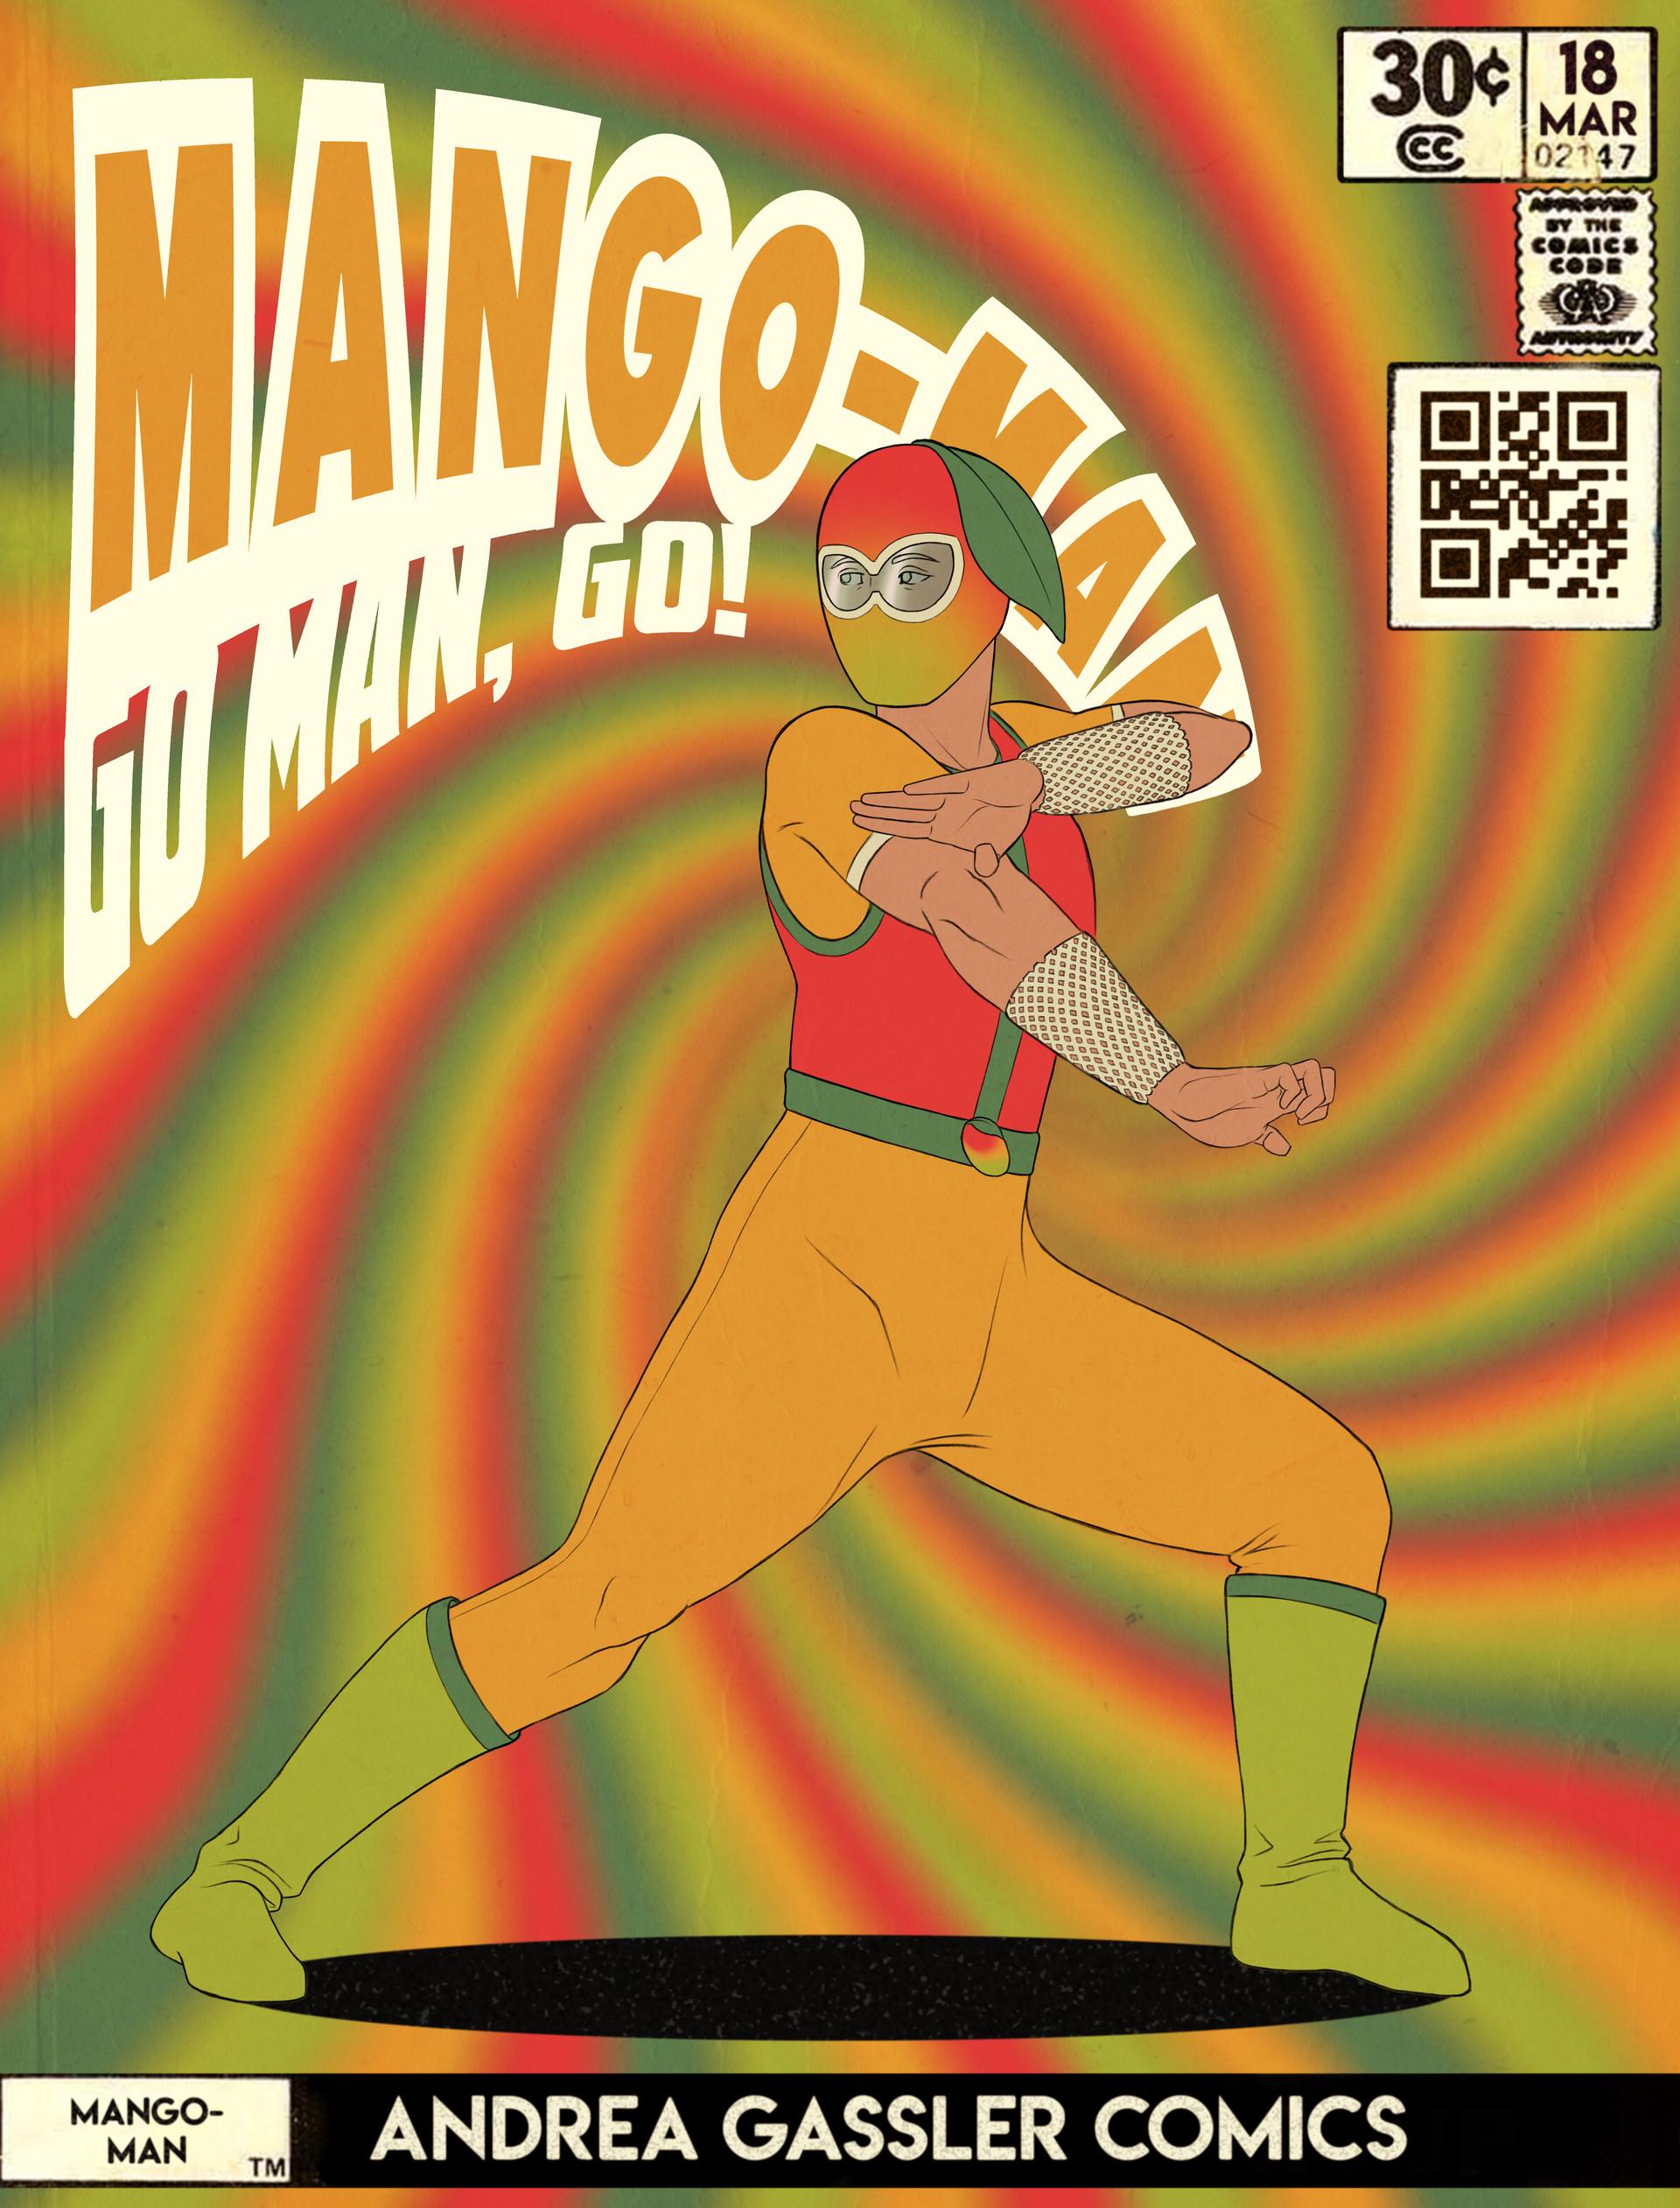 Mango-Man